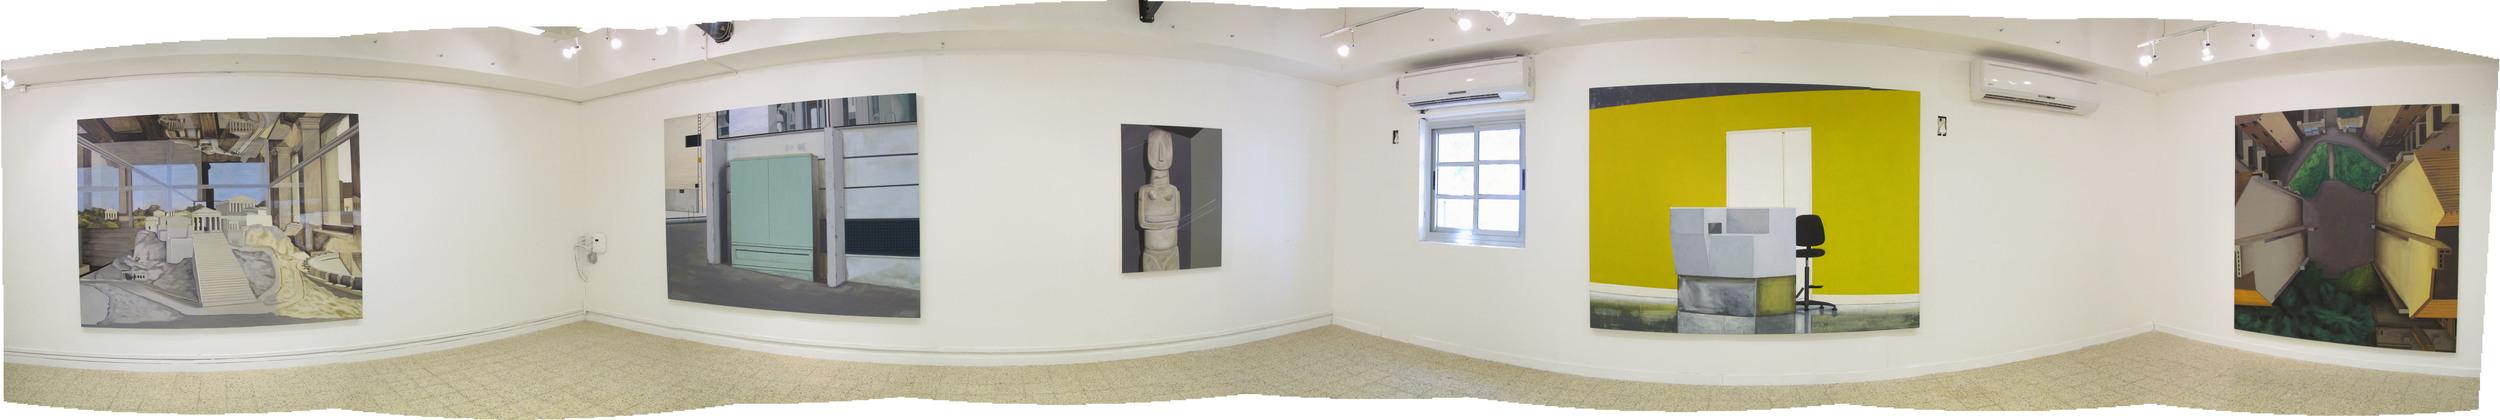 2013 - Graduation Exhibition, Hamidrasha School of Art